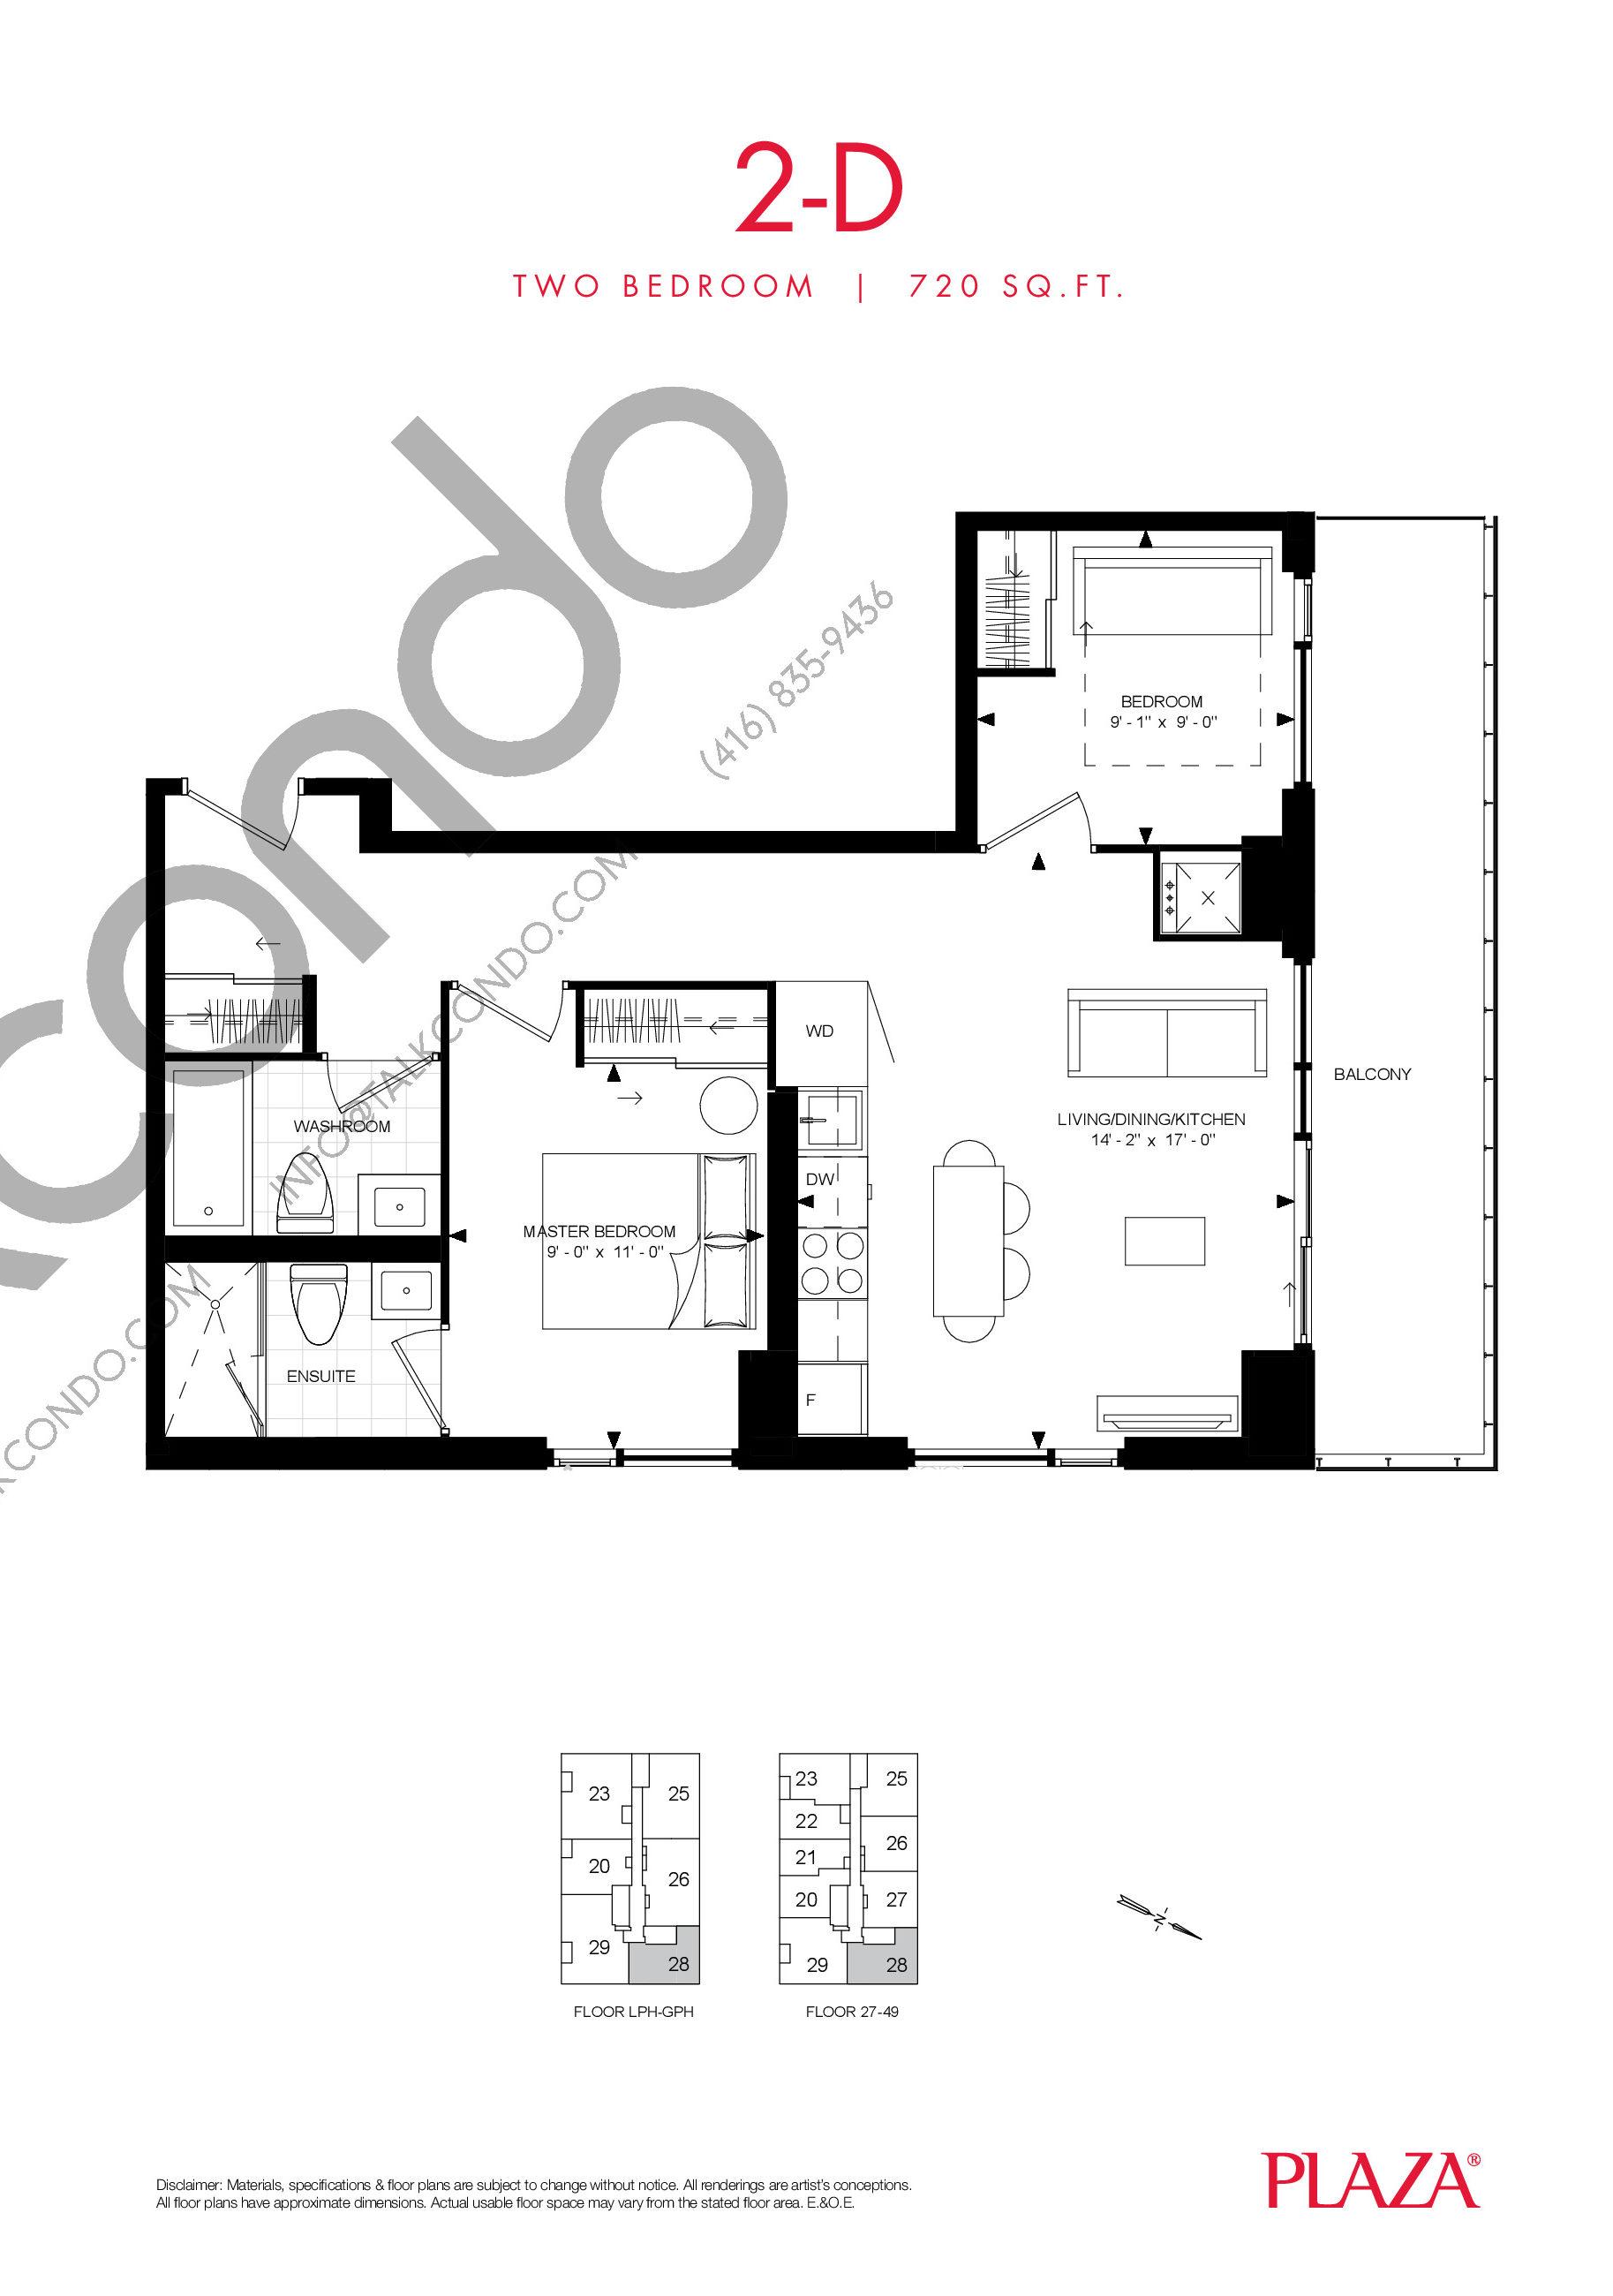 2-D Floor Plan at Encore Theatre District Condos - 720 sq.ft